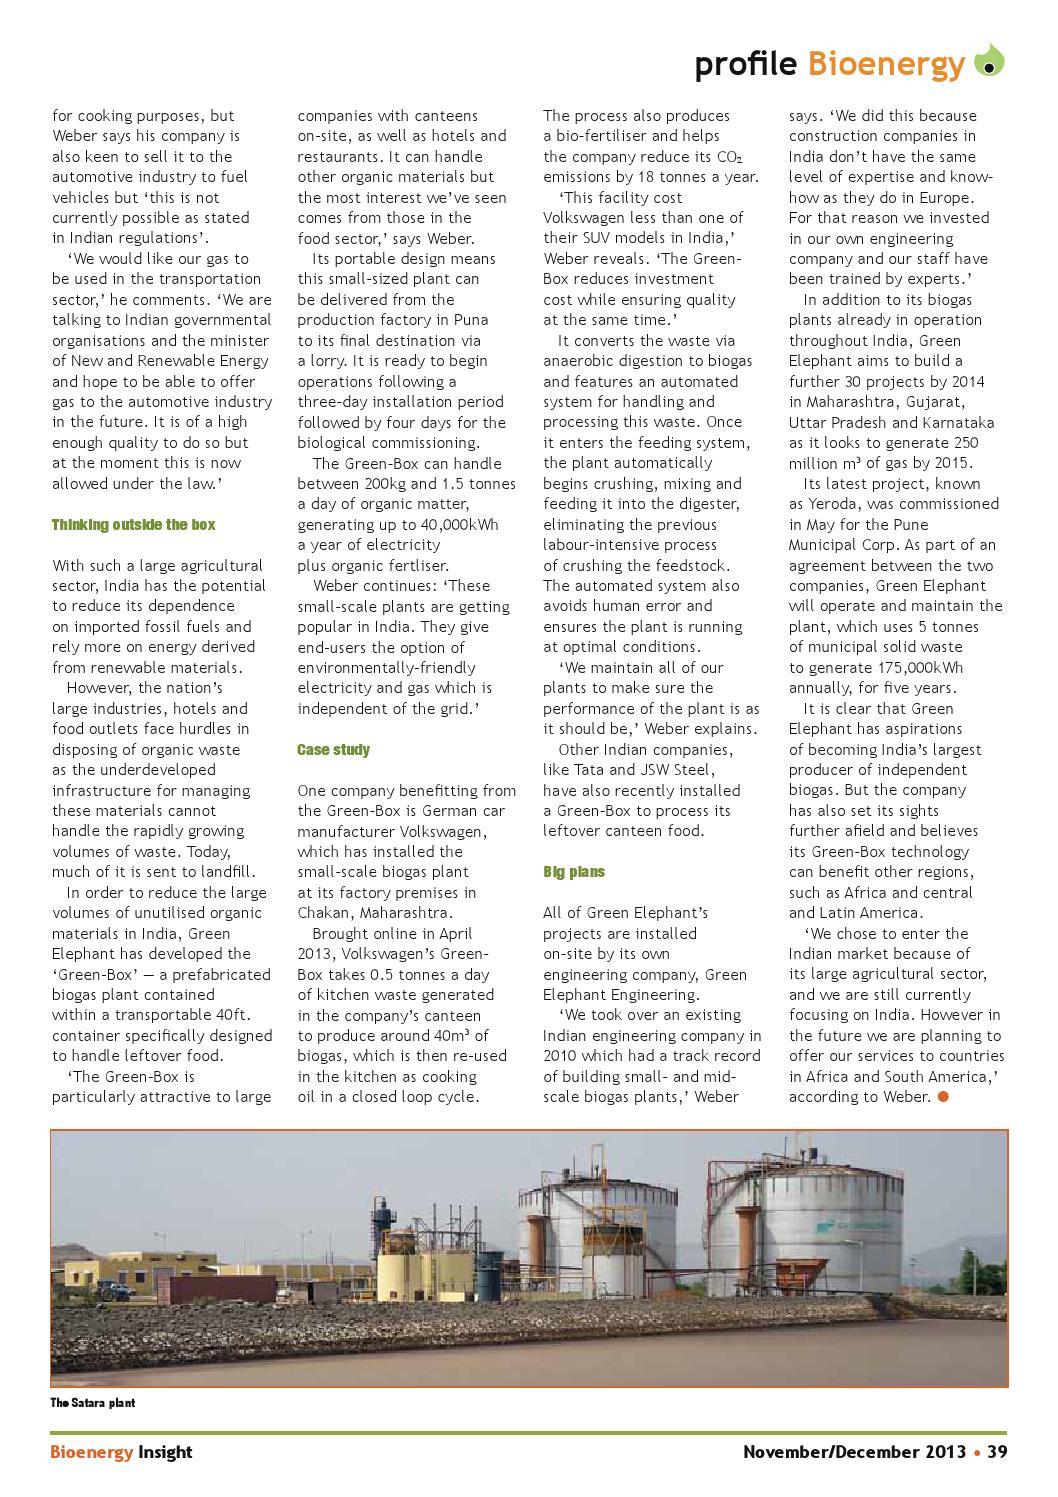 Bioenergy Insight November/December 2013 by Woodcote Media